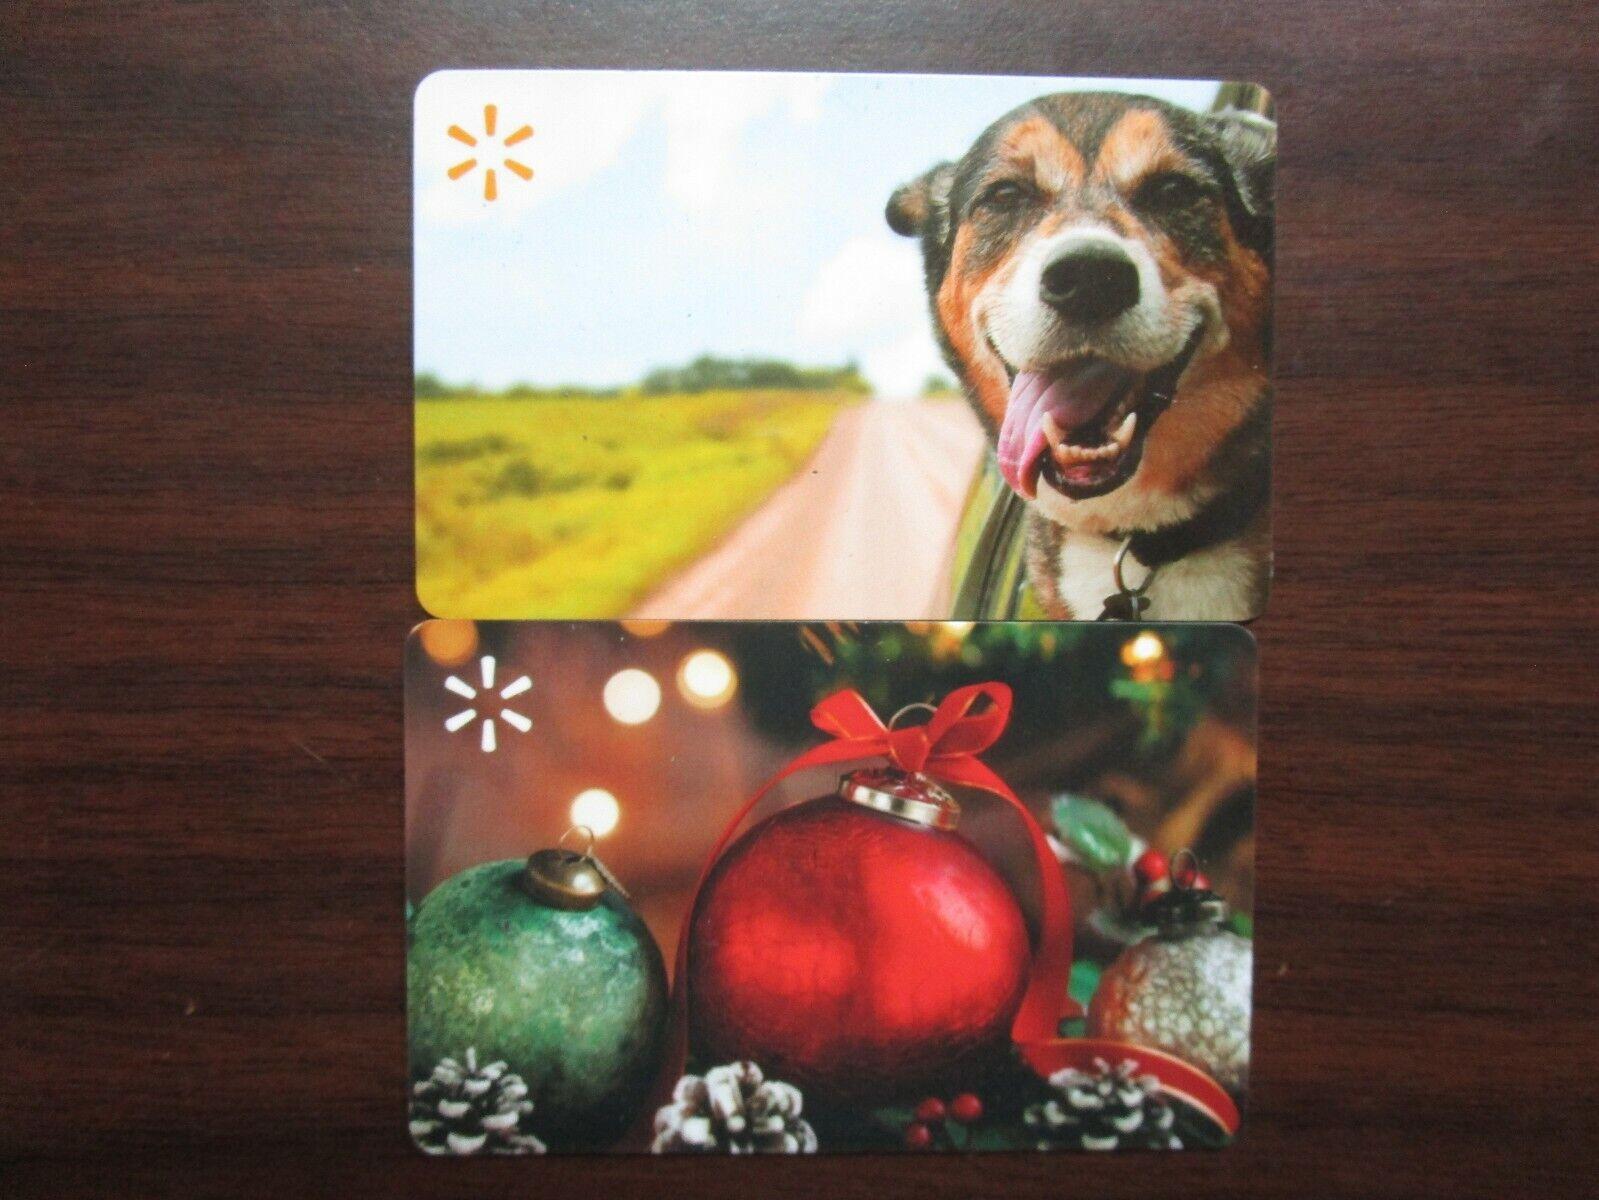 171.21 Walmart Gift Card Merchandise Credit BALANCE 171.21 - $170.00